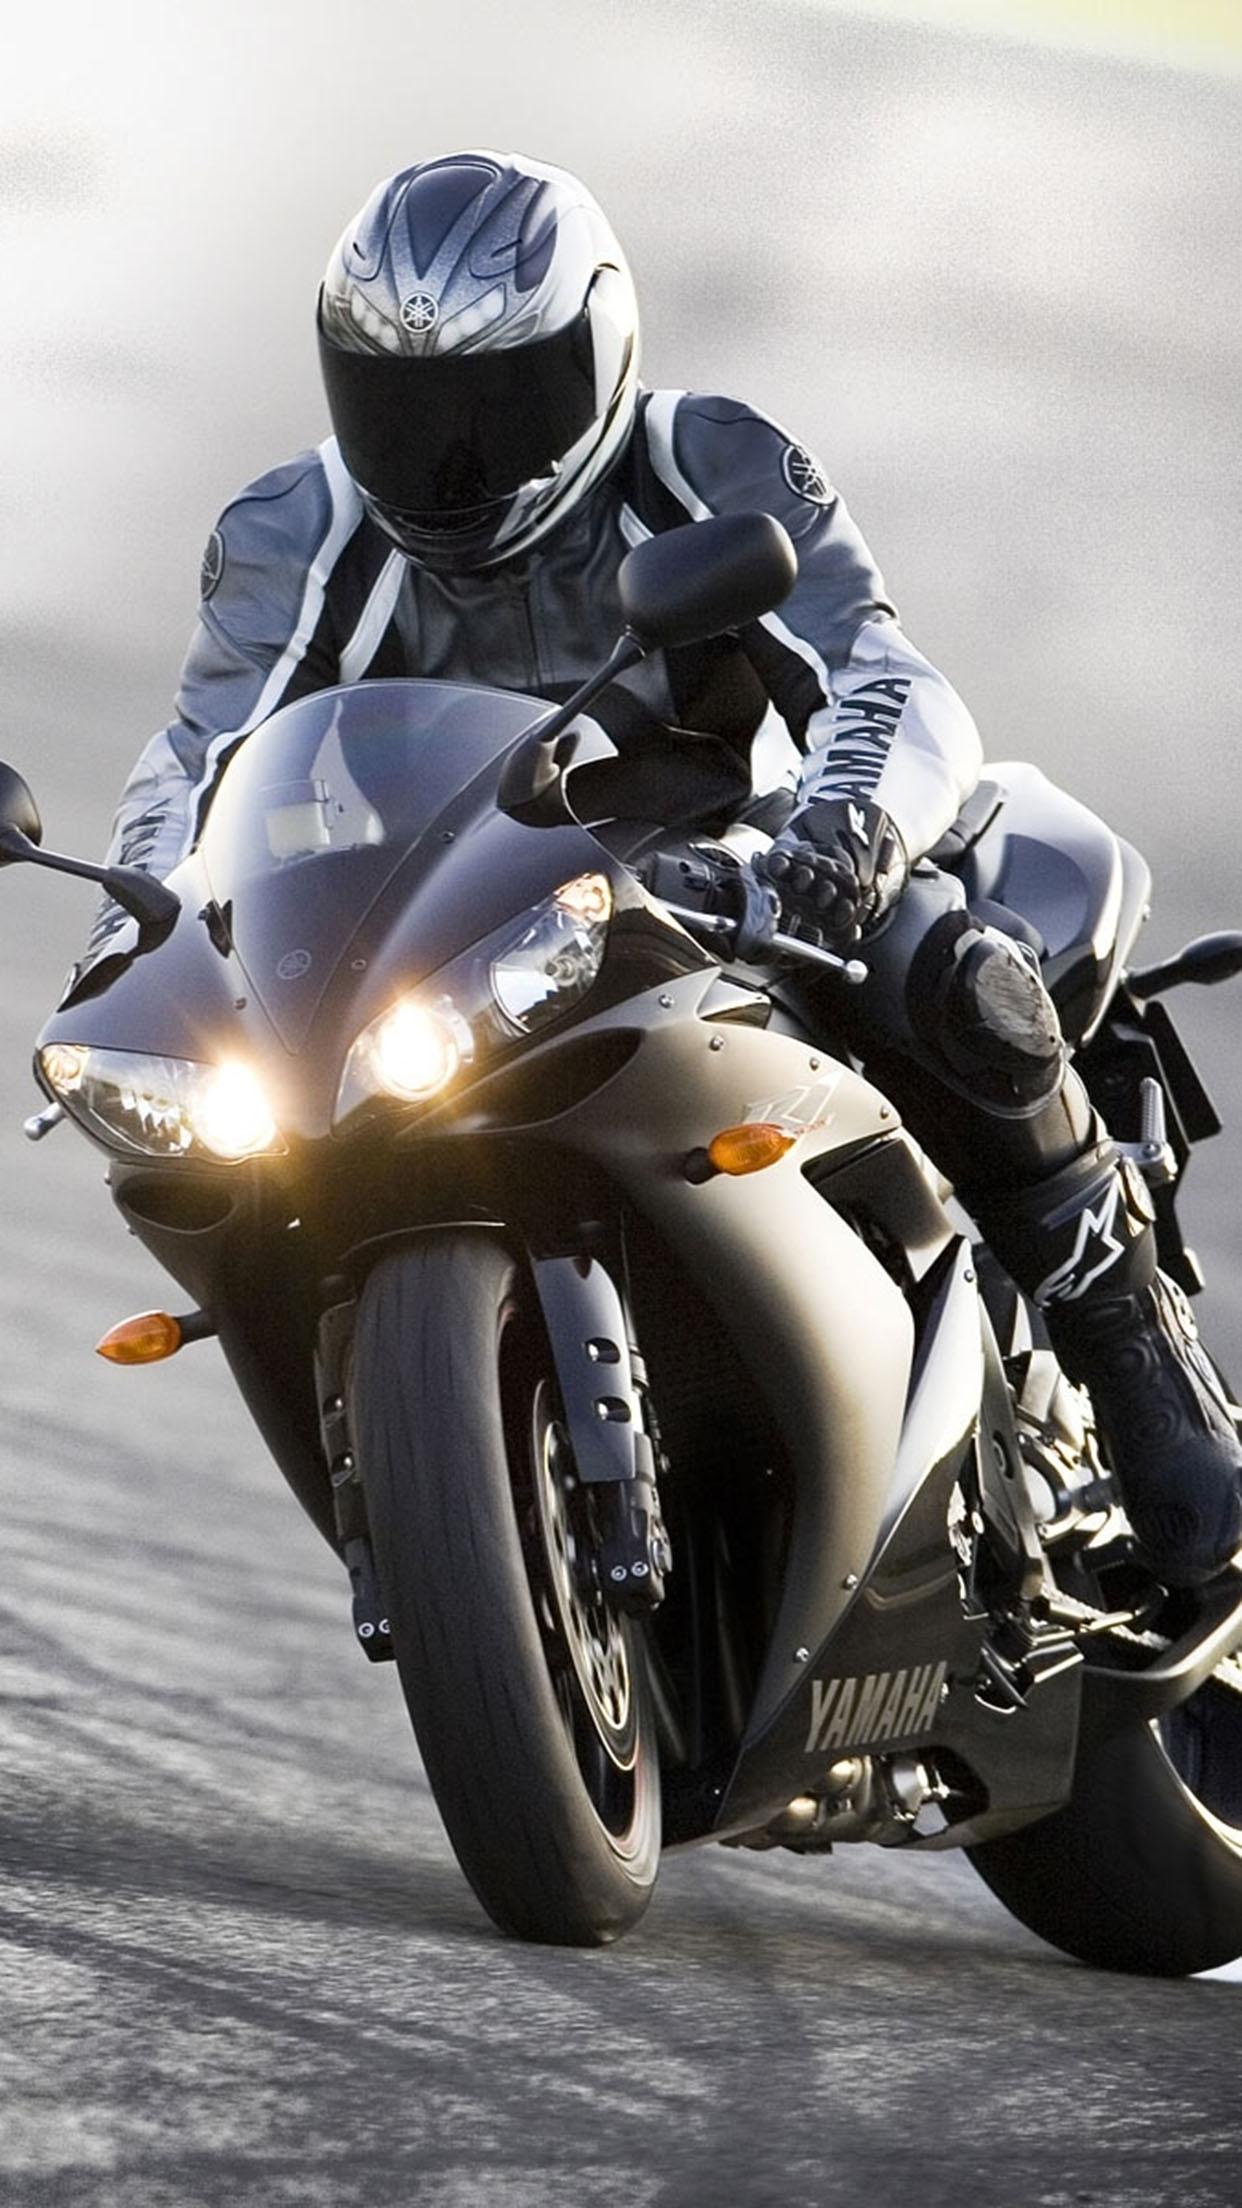 Supermotard moto Yamaha moto 3Wallpapers iPhone Parallax Yamaha Bike